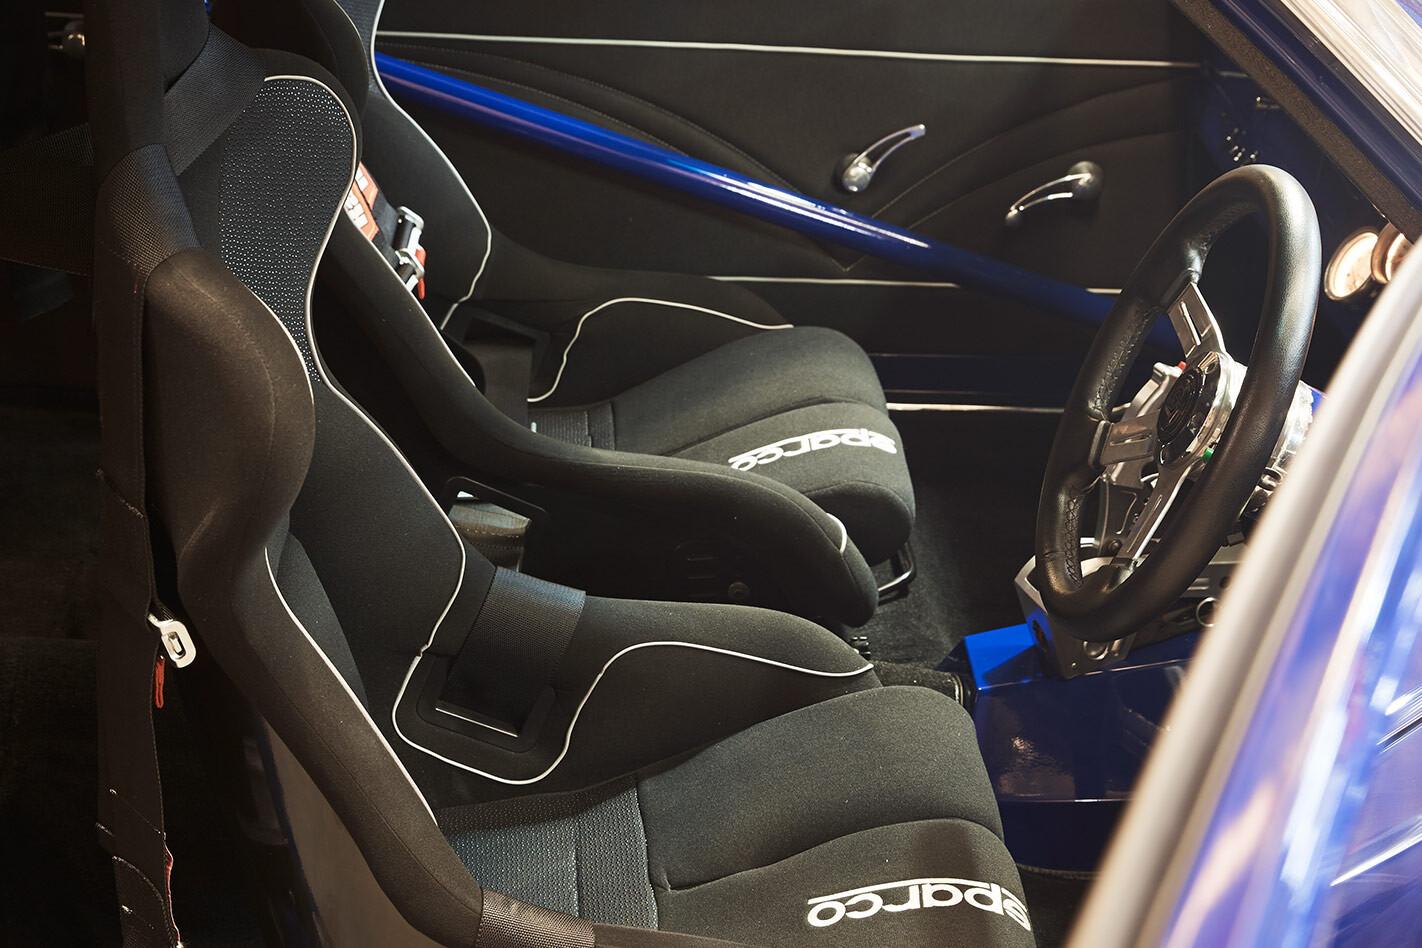 Ford Futura seats